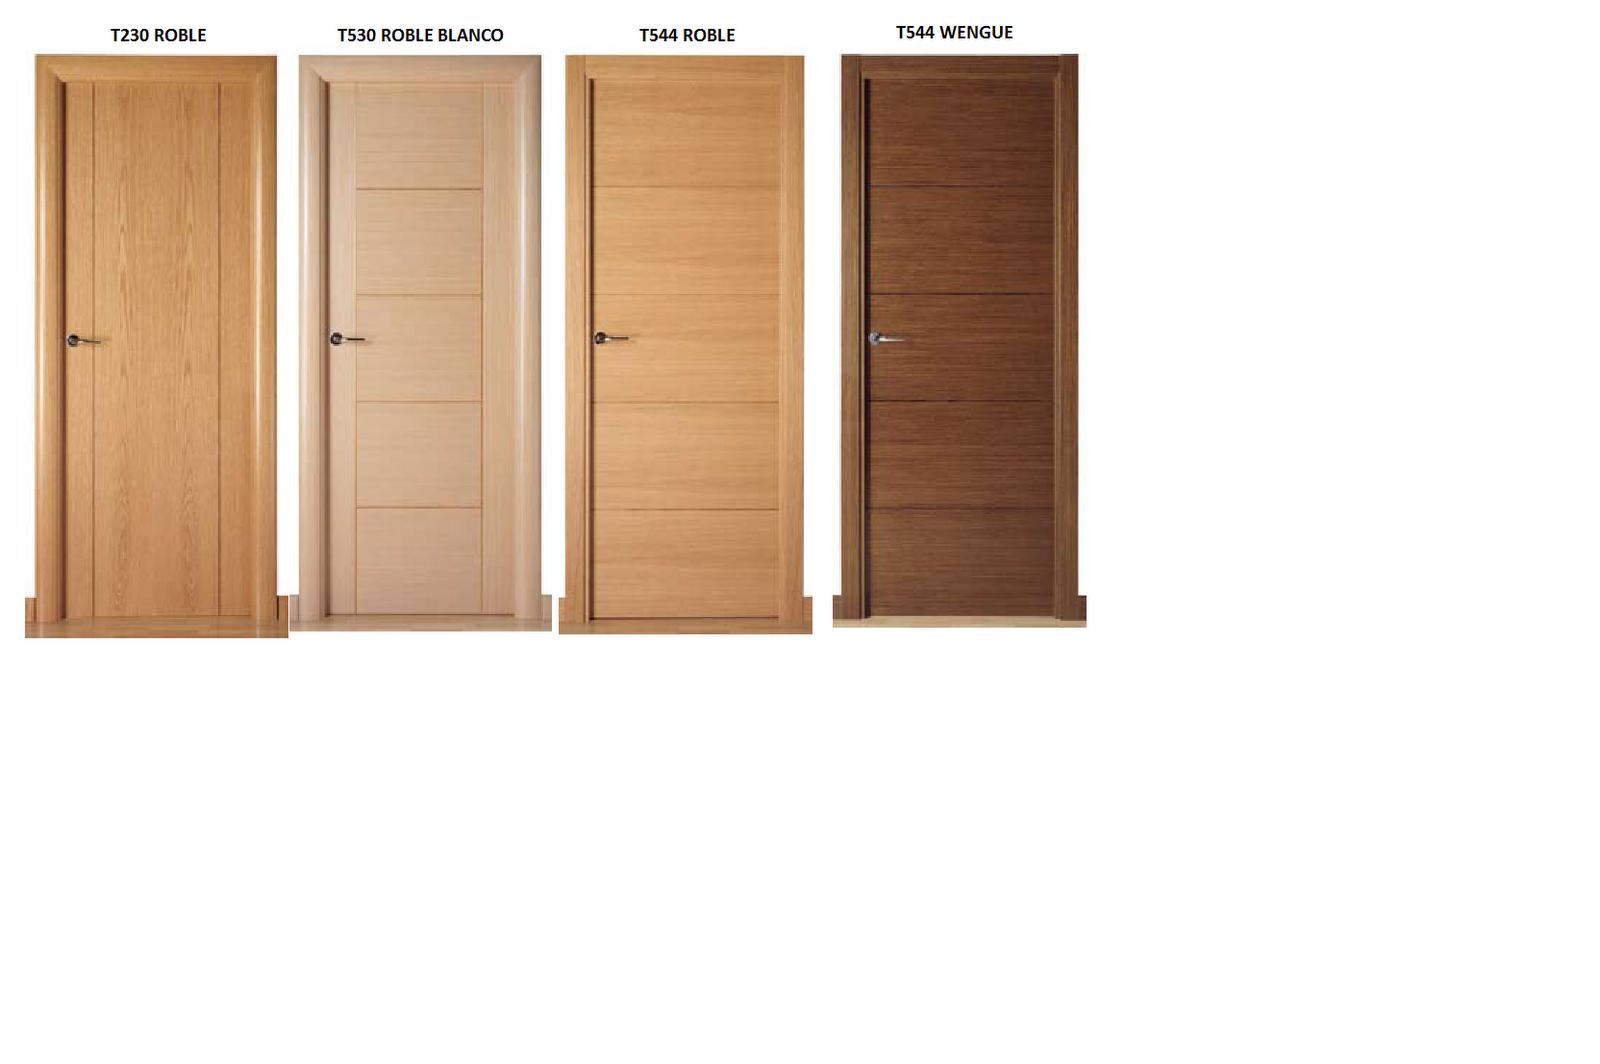 Carpinter a de madera mart n torralbo puertas for Puertas en madera para interiores